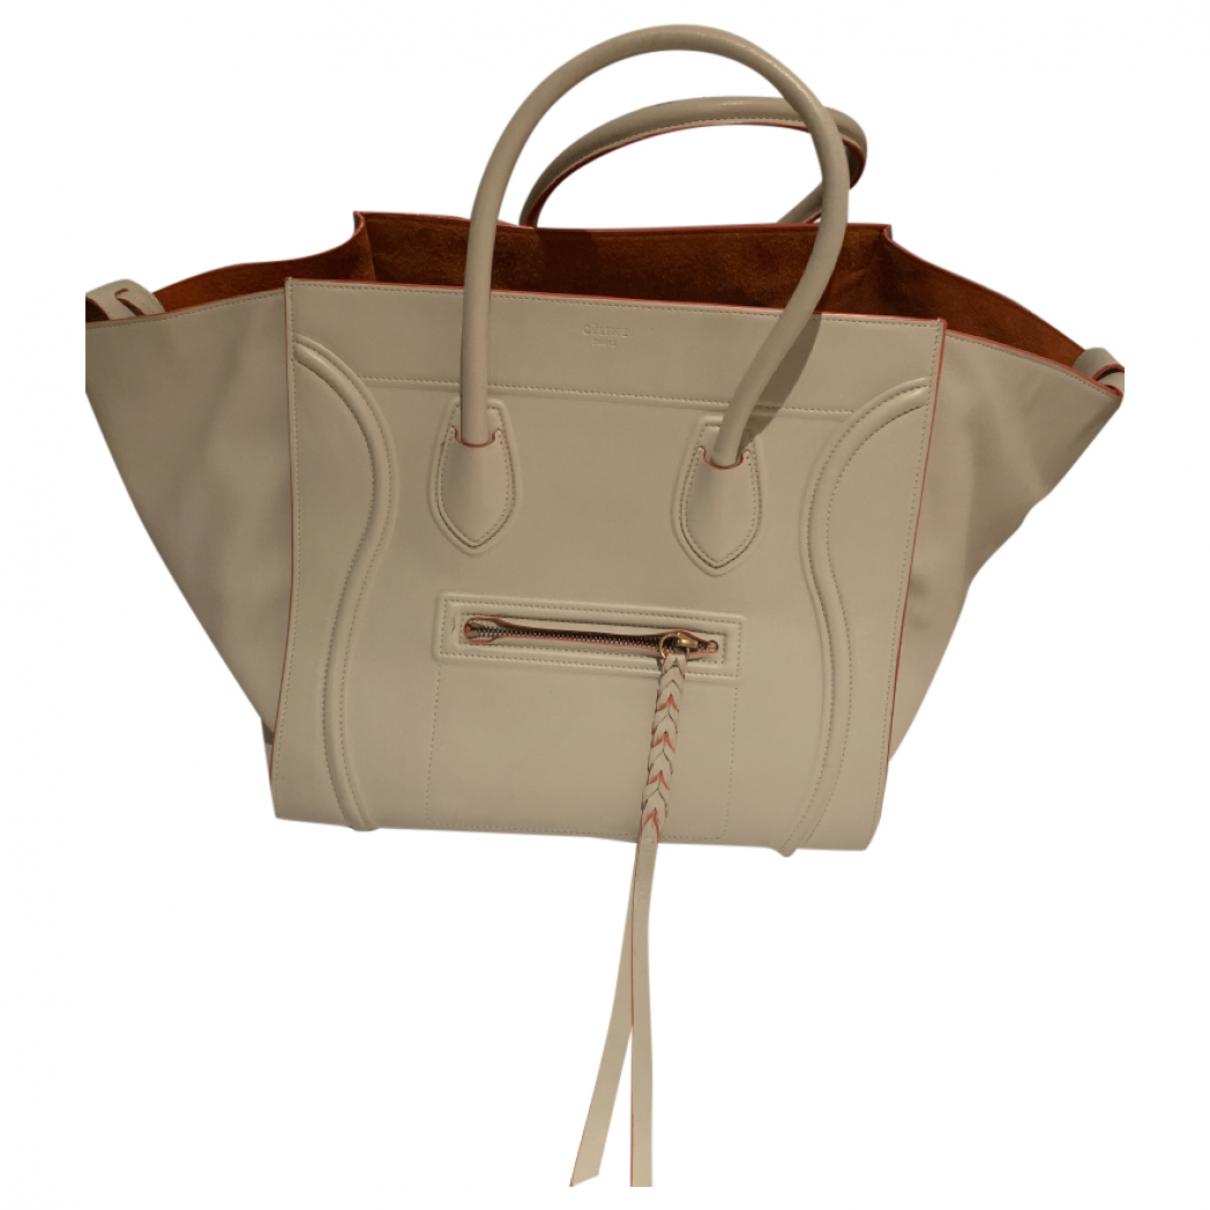 Celine Luggage Phantom Handtasche in  Beige Leder